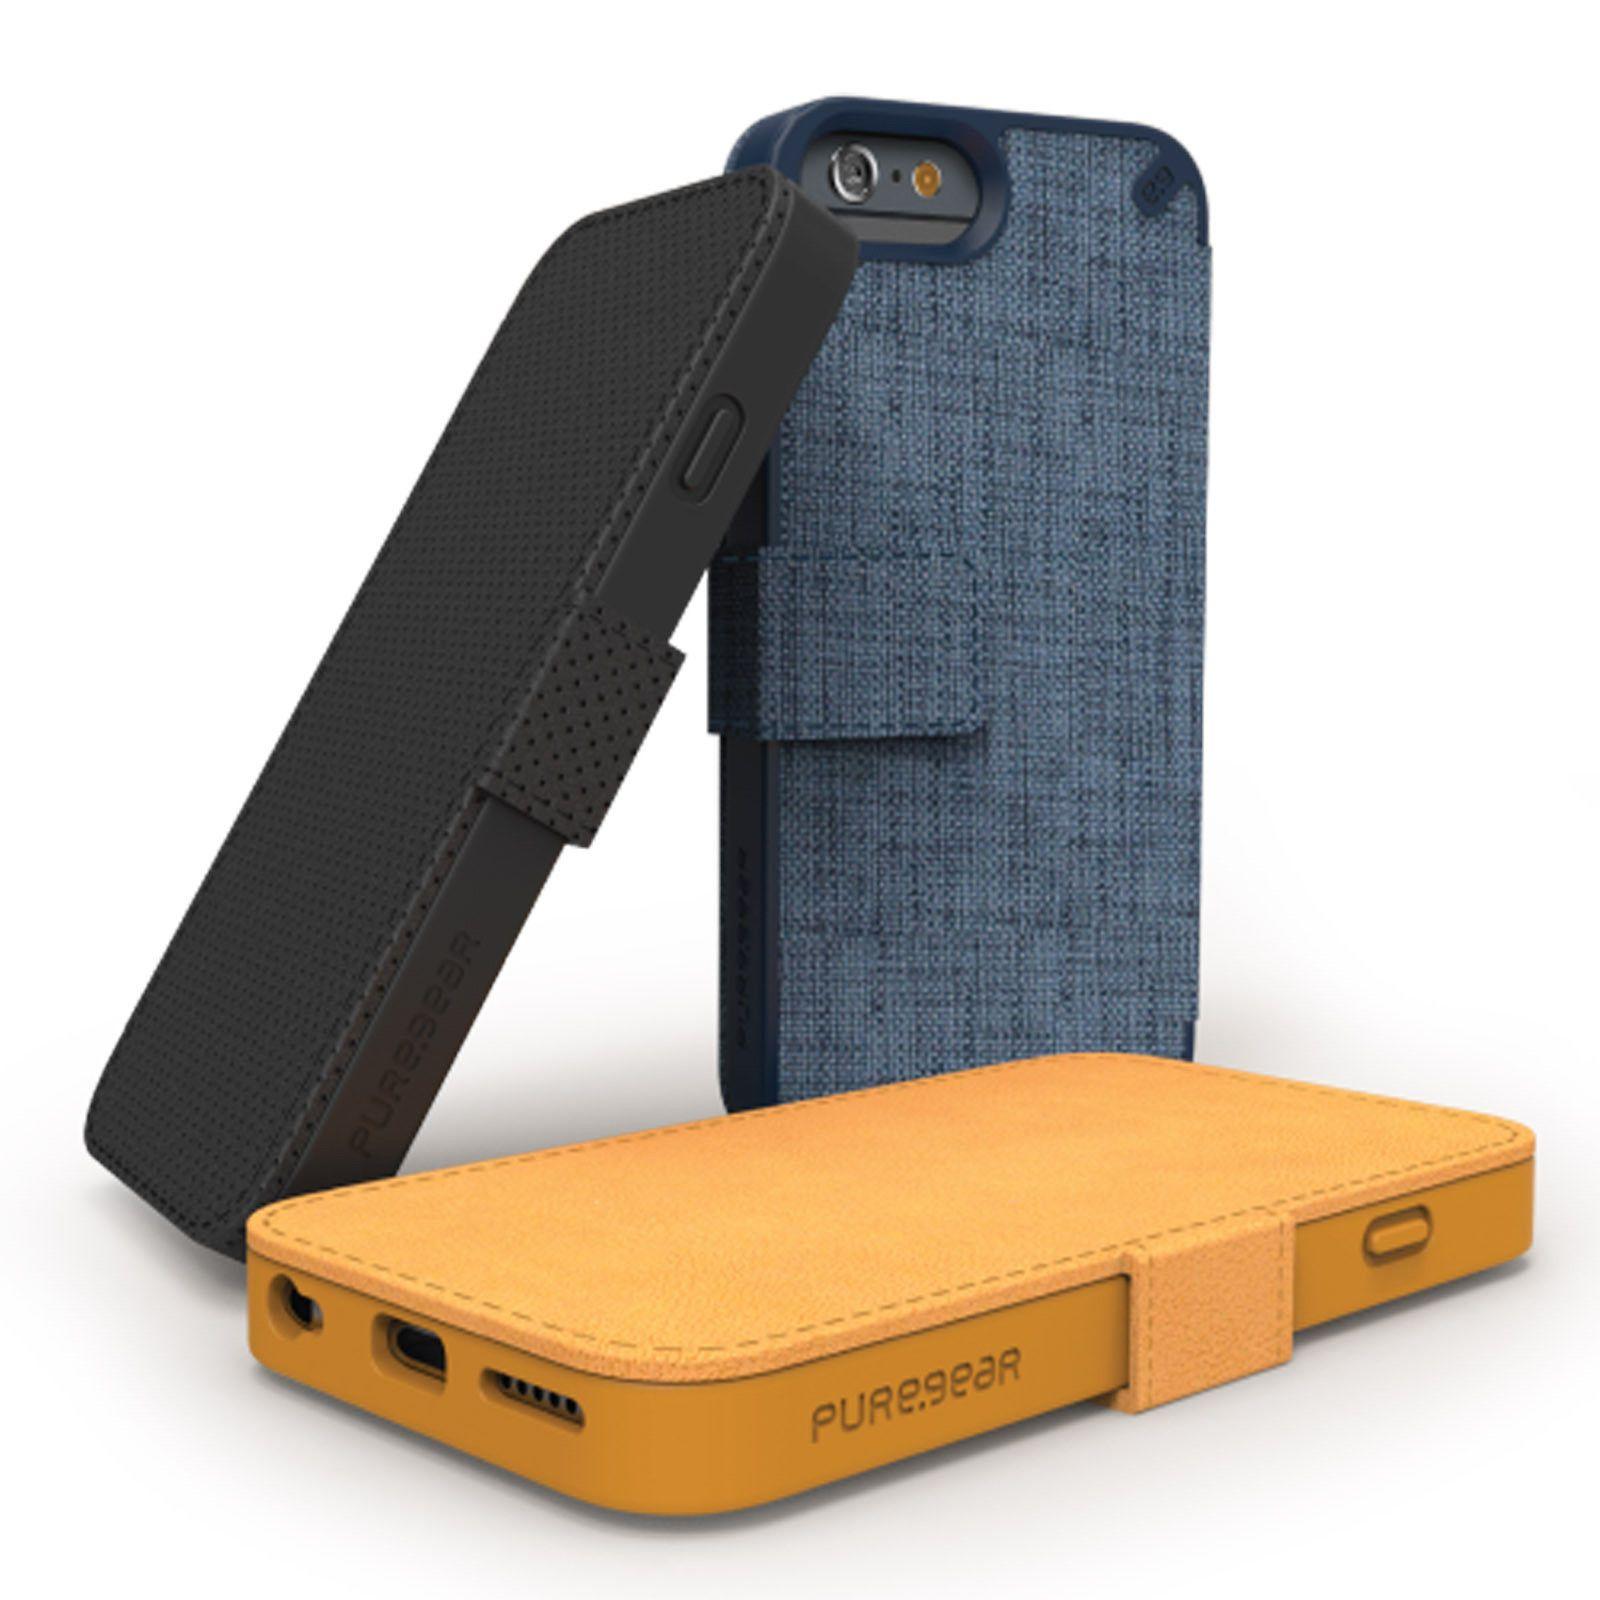 pretty nice 84983 32514 Details about PureGear Express Folio Flip Case for iPhone 6/6S Plus ...